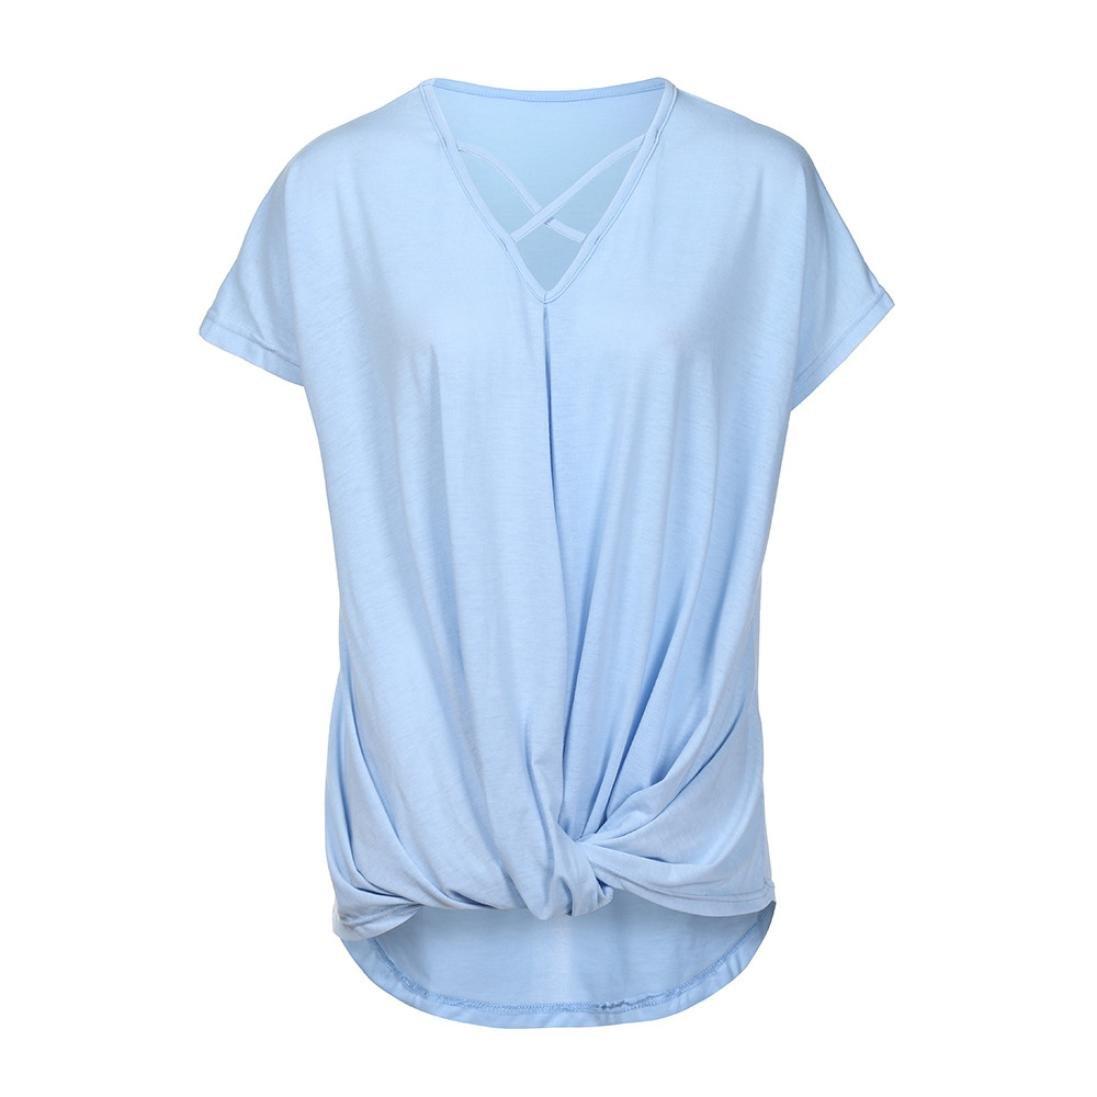 TIFIY Frauen Gestreiften unregelm/ä/ßigen Saum Geraffte Camisole /ärmellose Tank Tops Sommer Pullover T-Shirt Bluse